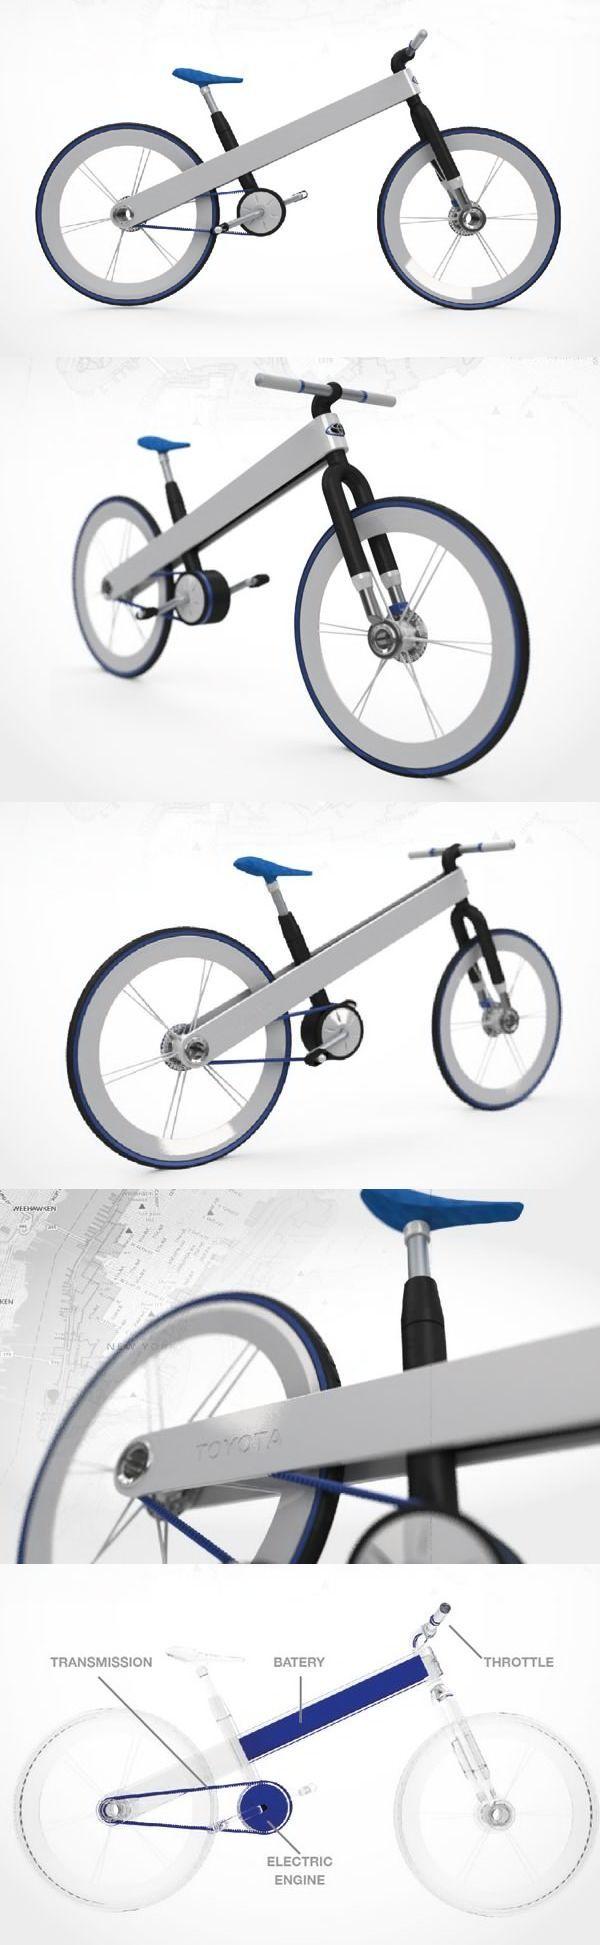 "Designer Francisco ""Ulla's"" concept for a Toyota brand hybrid bike"